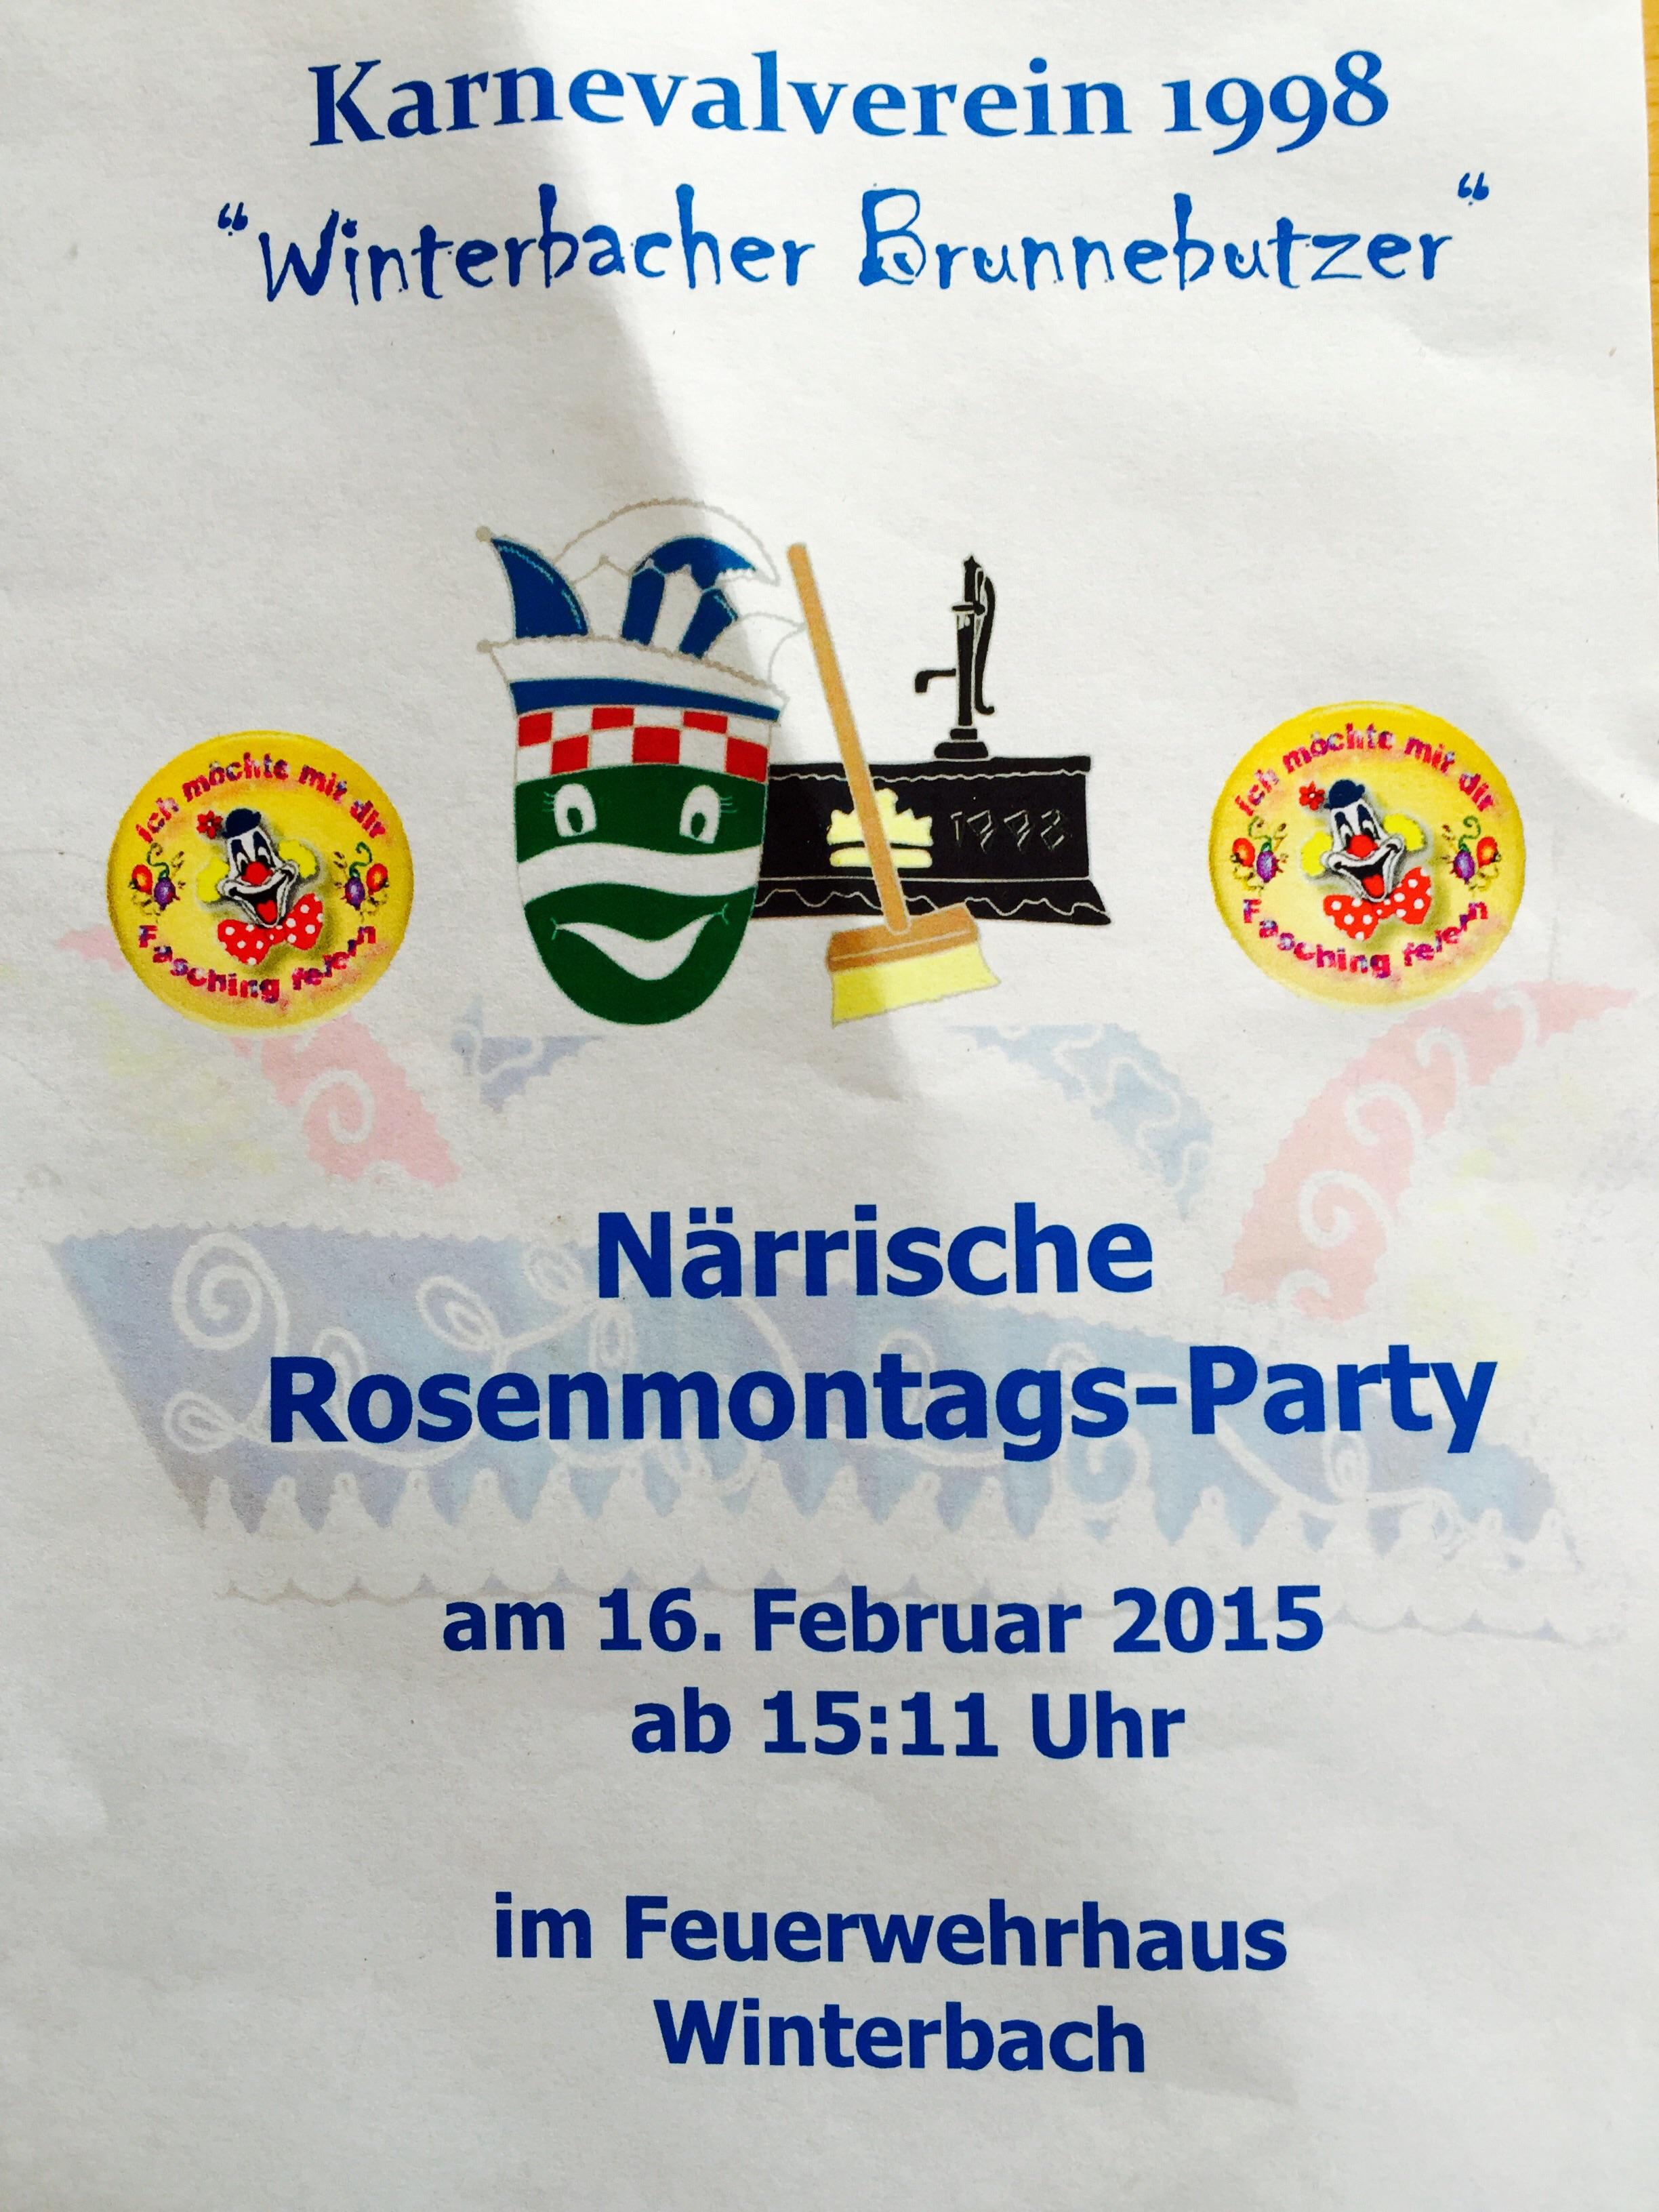 Rosenmontagsparty 2015